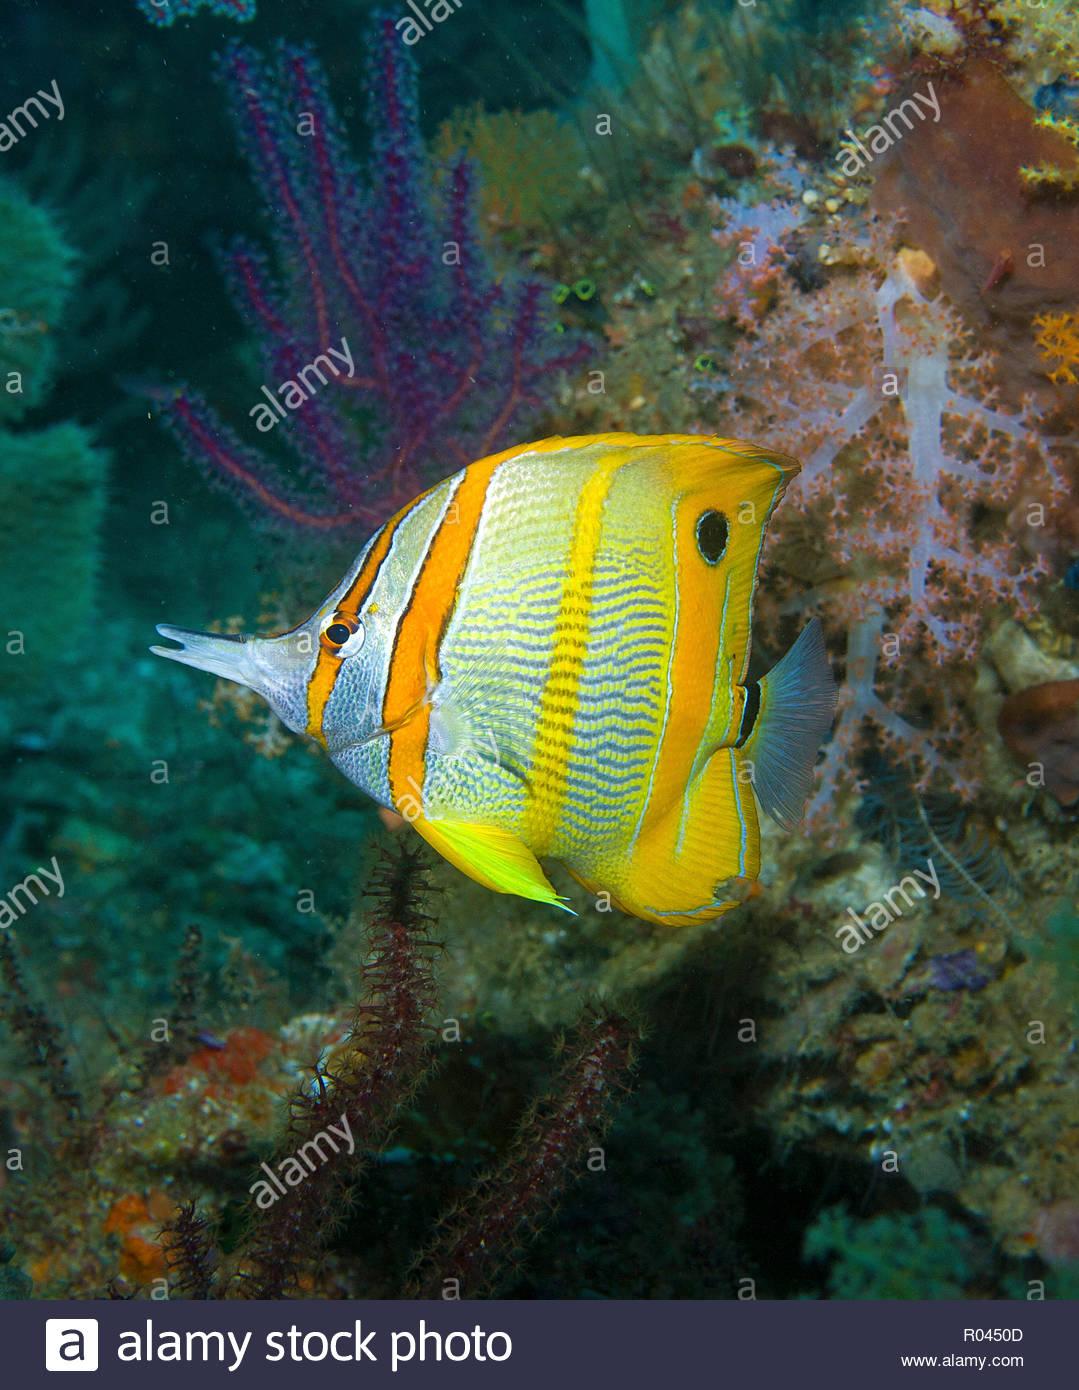 Long-beaked coralfish, Beaked butterflyfish or Copper-banded butterflyfish (Chelmon rostratus), Raja Ampat, Irian Jaya, Indonesia - Stock Image